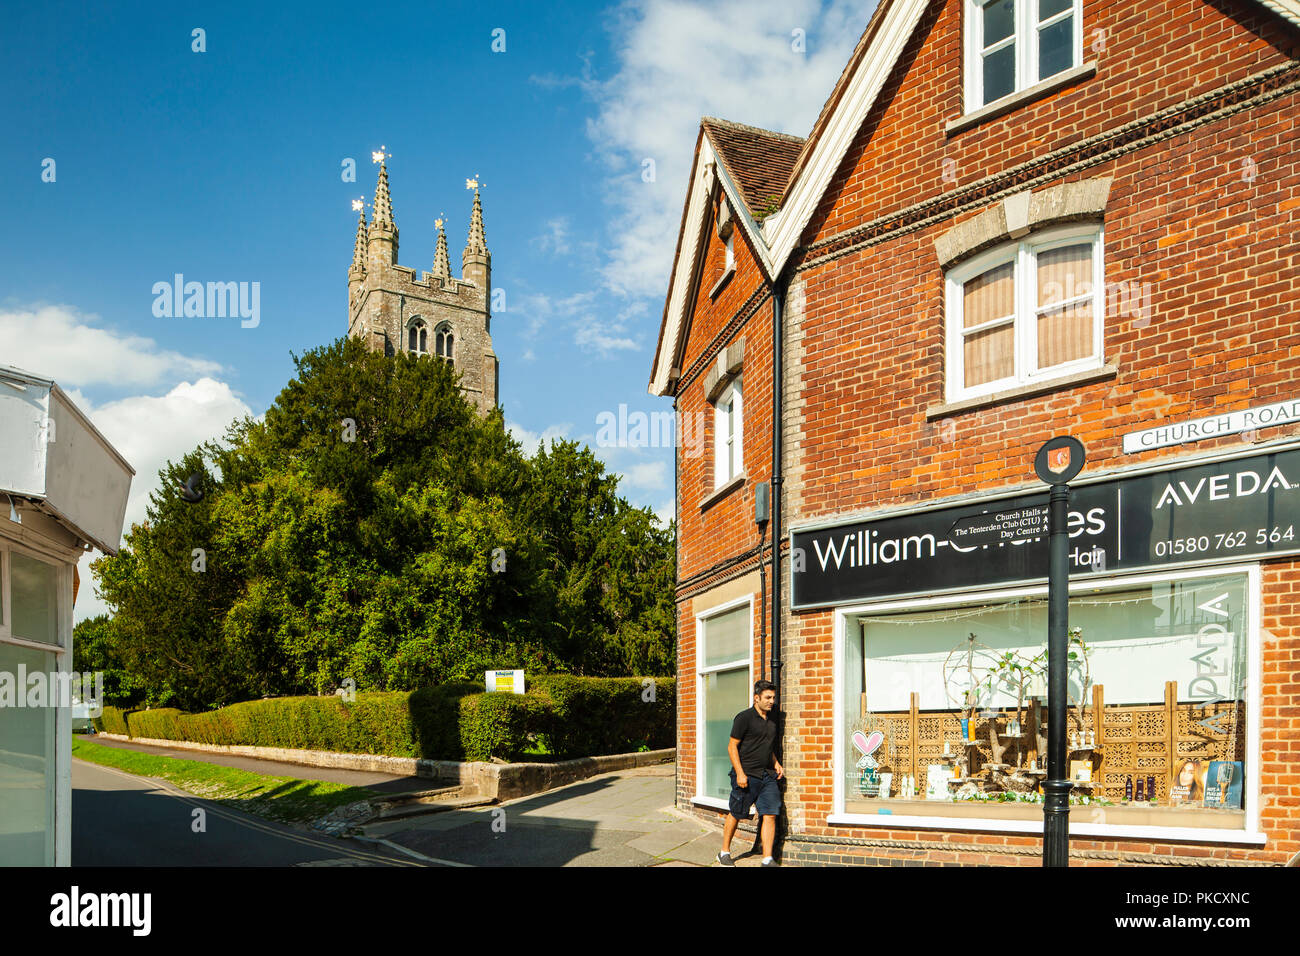 Summer afternoon in Tenterden, Kent, England. - Stock Image